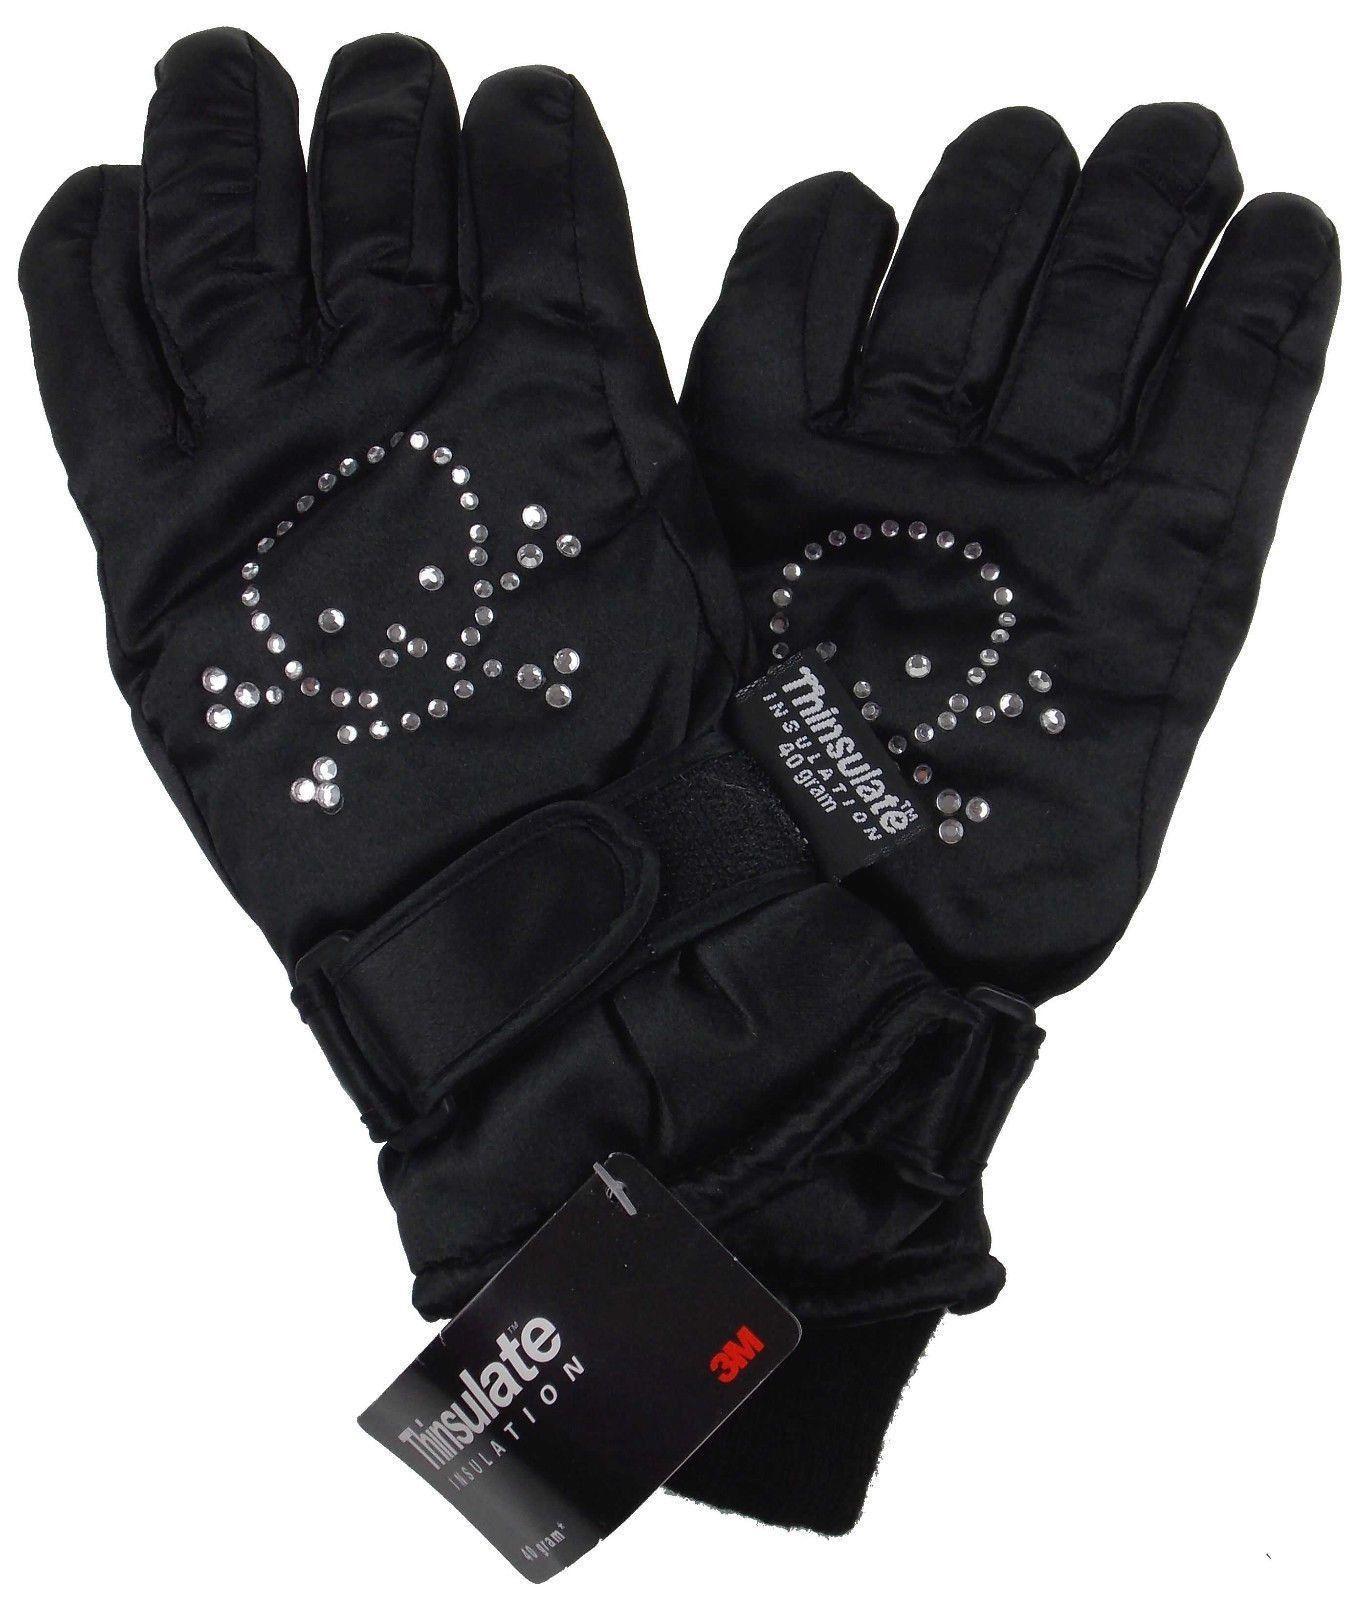 Joe Boxer Girls Ski Gloves Blue Warm 3M Thinsulate 40g Waterproof Winter Sports